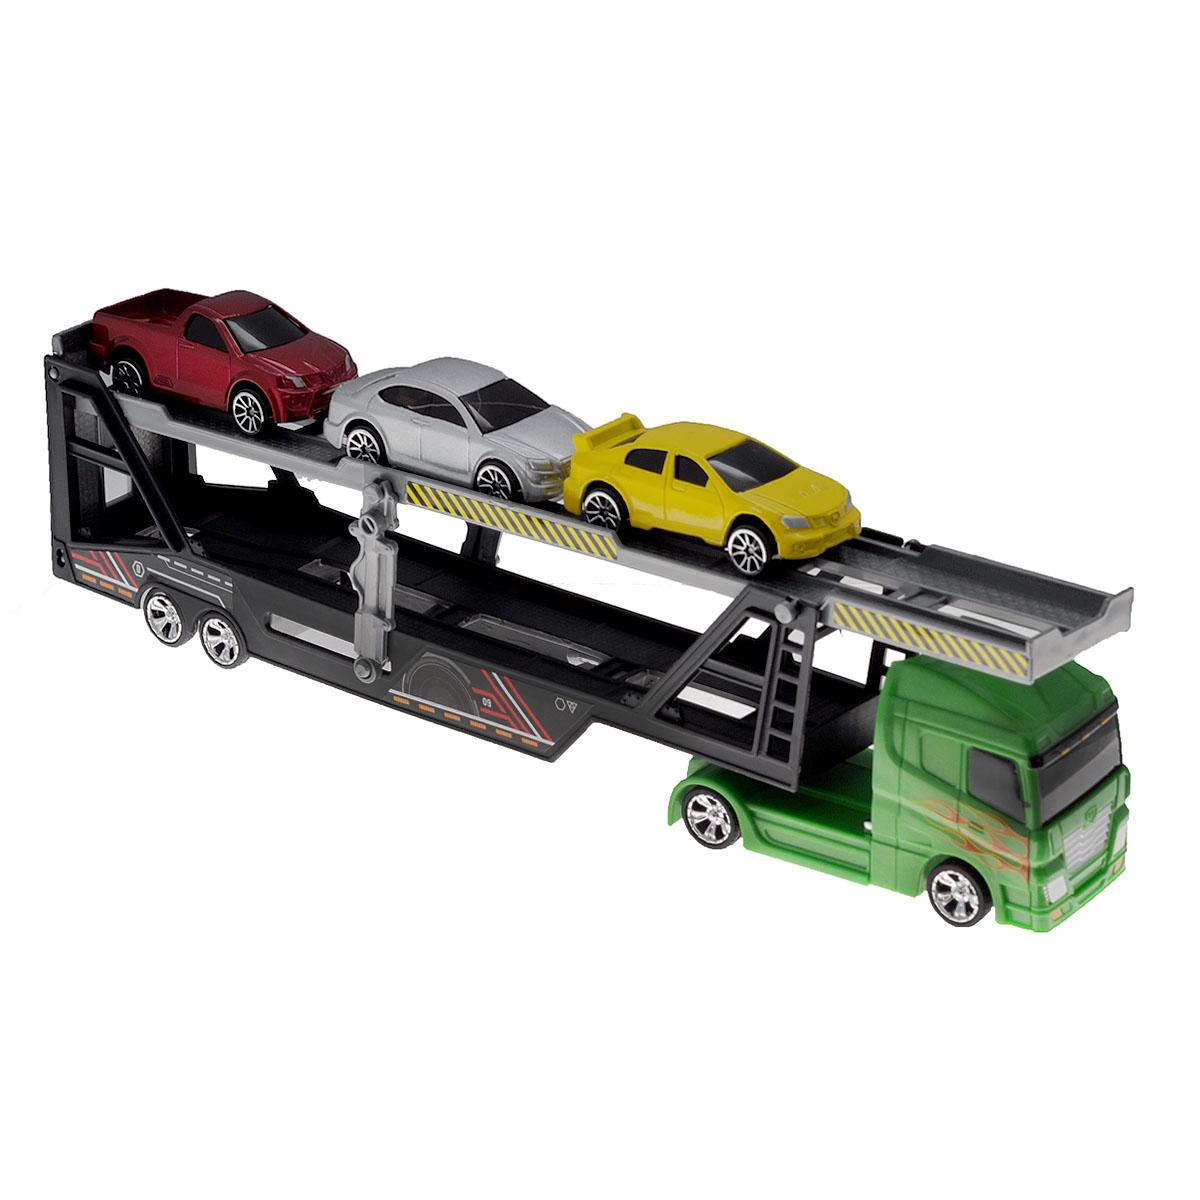 MotorMax Игровой набор Car Transporter цвет зеленый набор для сборки машинки s2 muscle car deluxe modarri